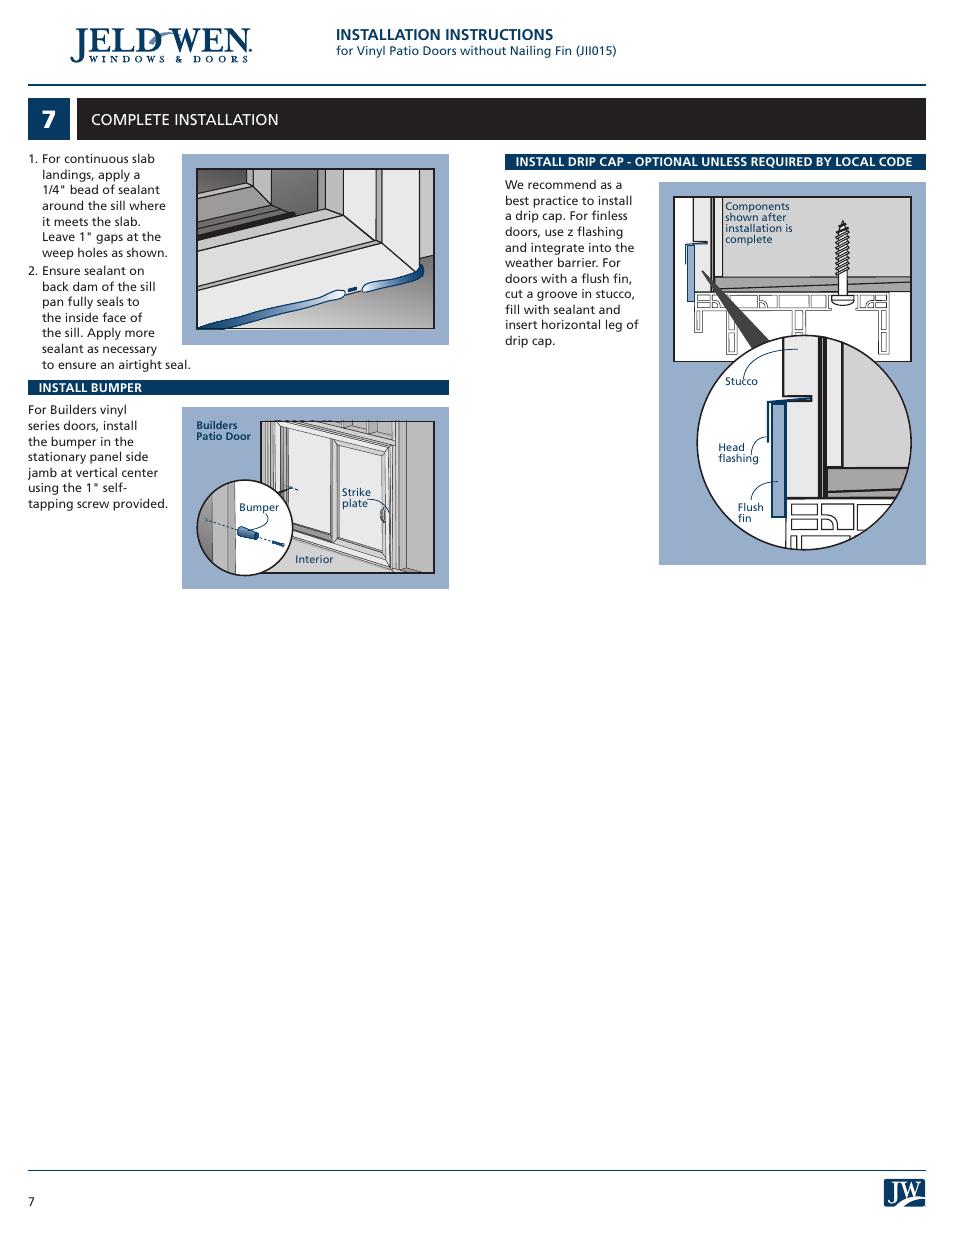 Jeld Wen Jii015 Vinyl Patio Doors Without Nailing Fin User Manual